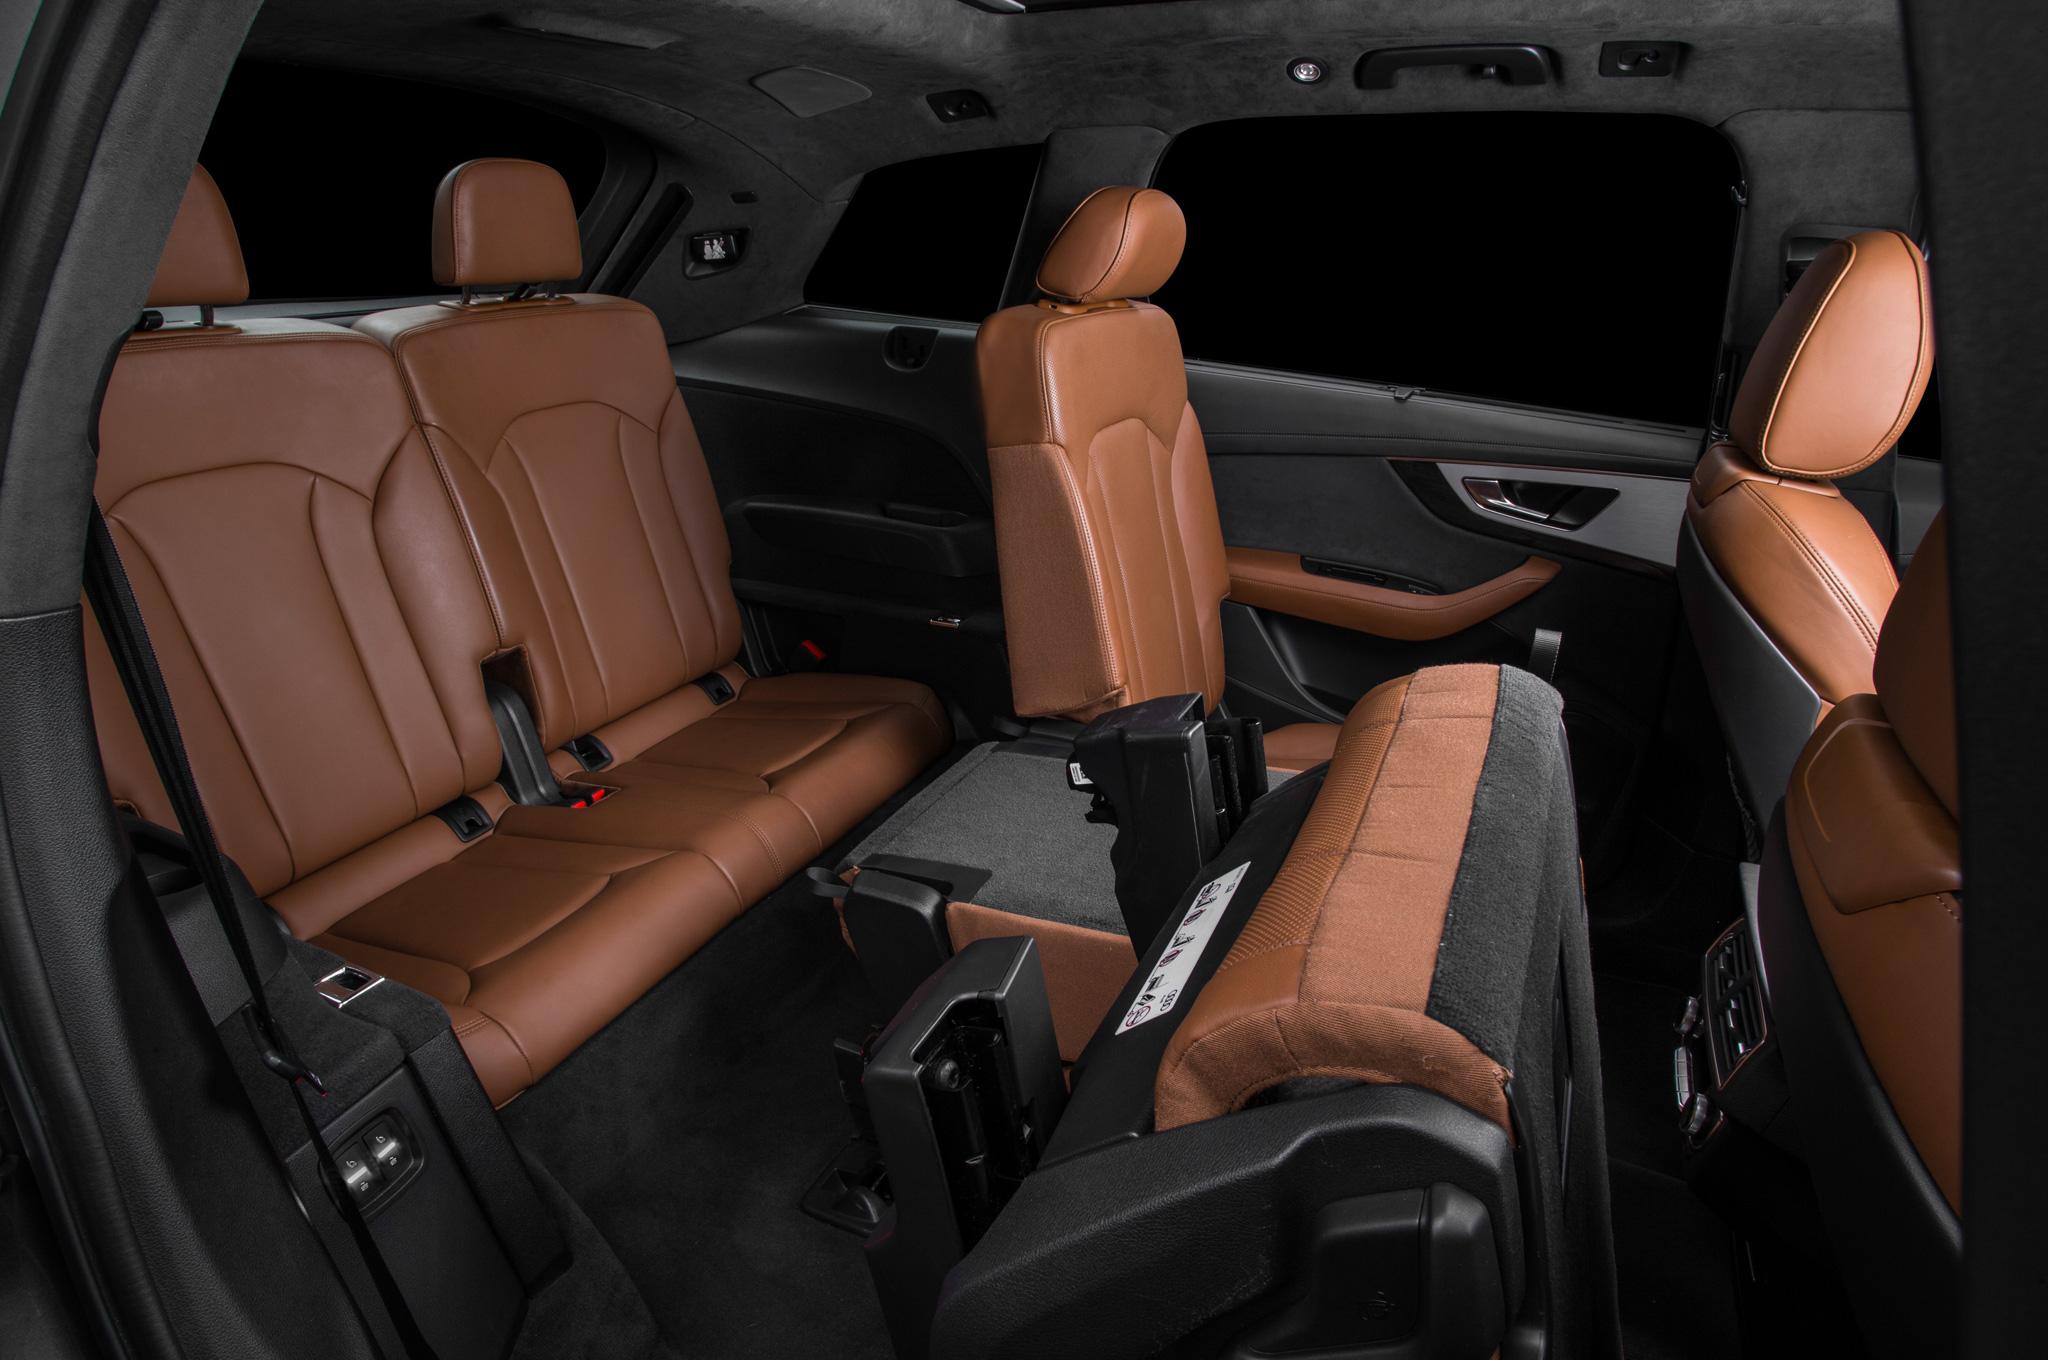 2017 Audi Q7 SUV Interior View